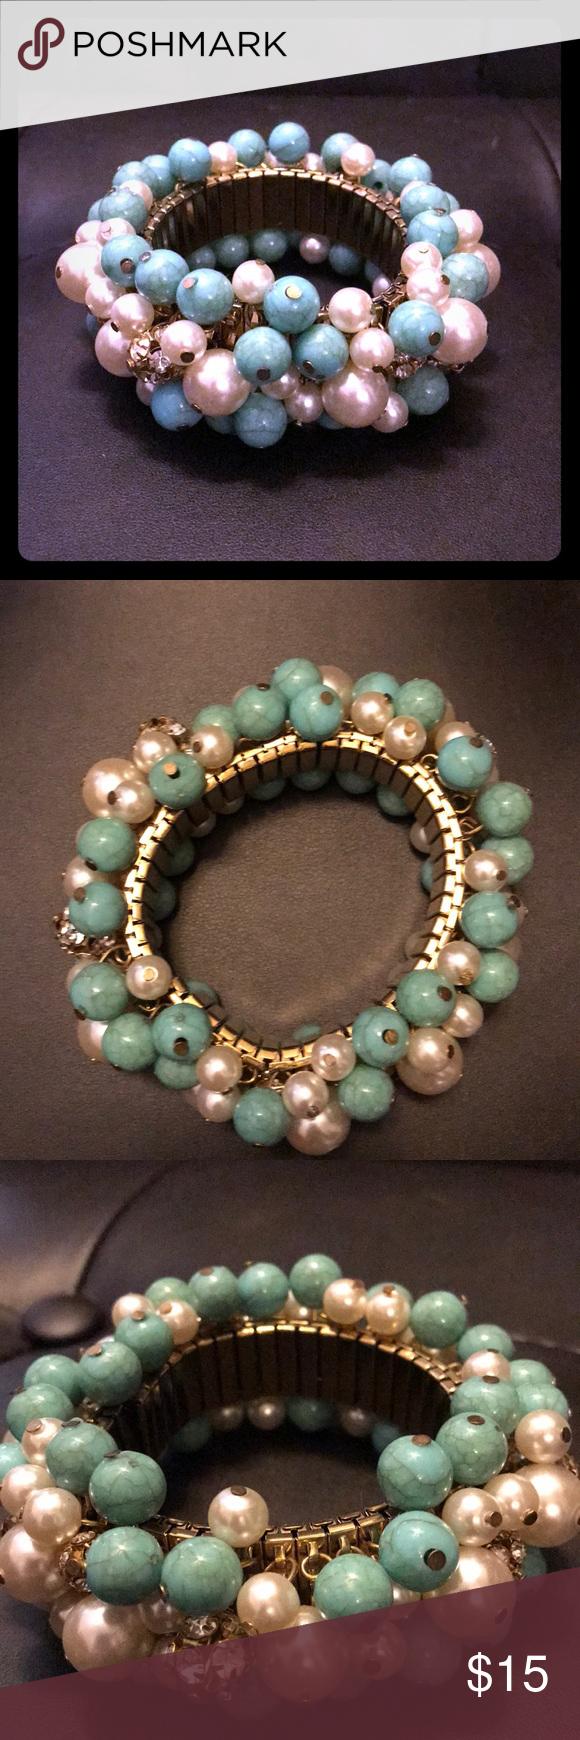 Vintage turquoise and jewel beaded bracelet vintage bracelet in